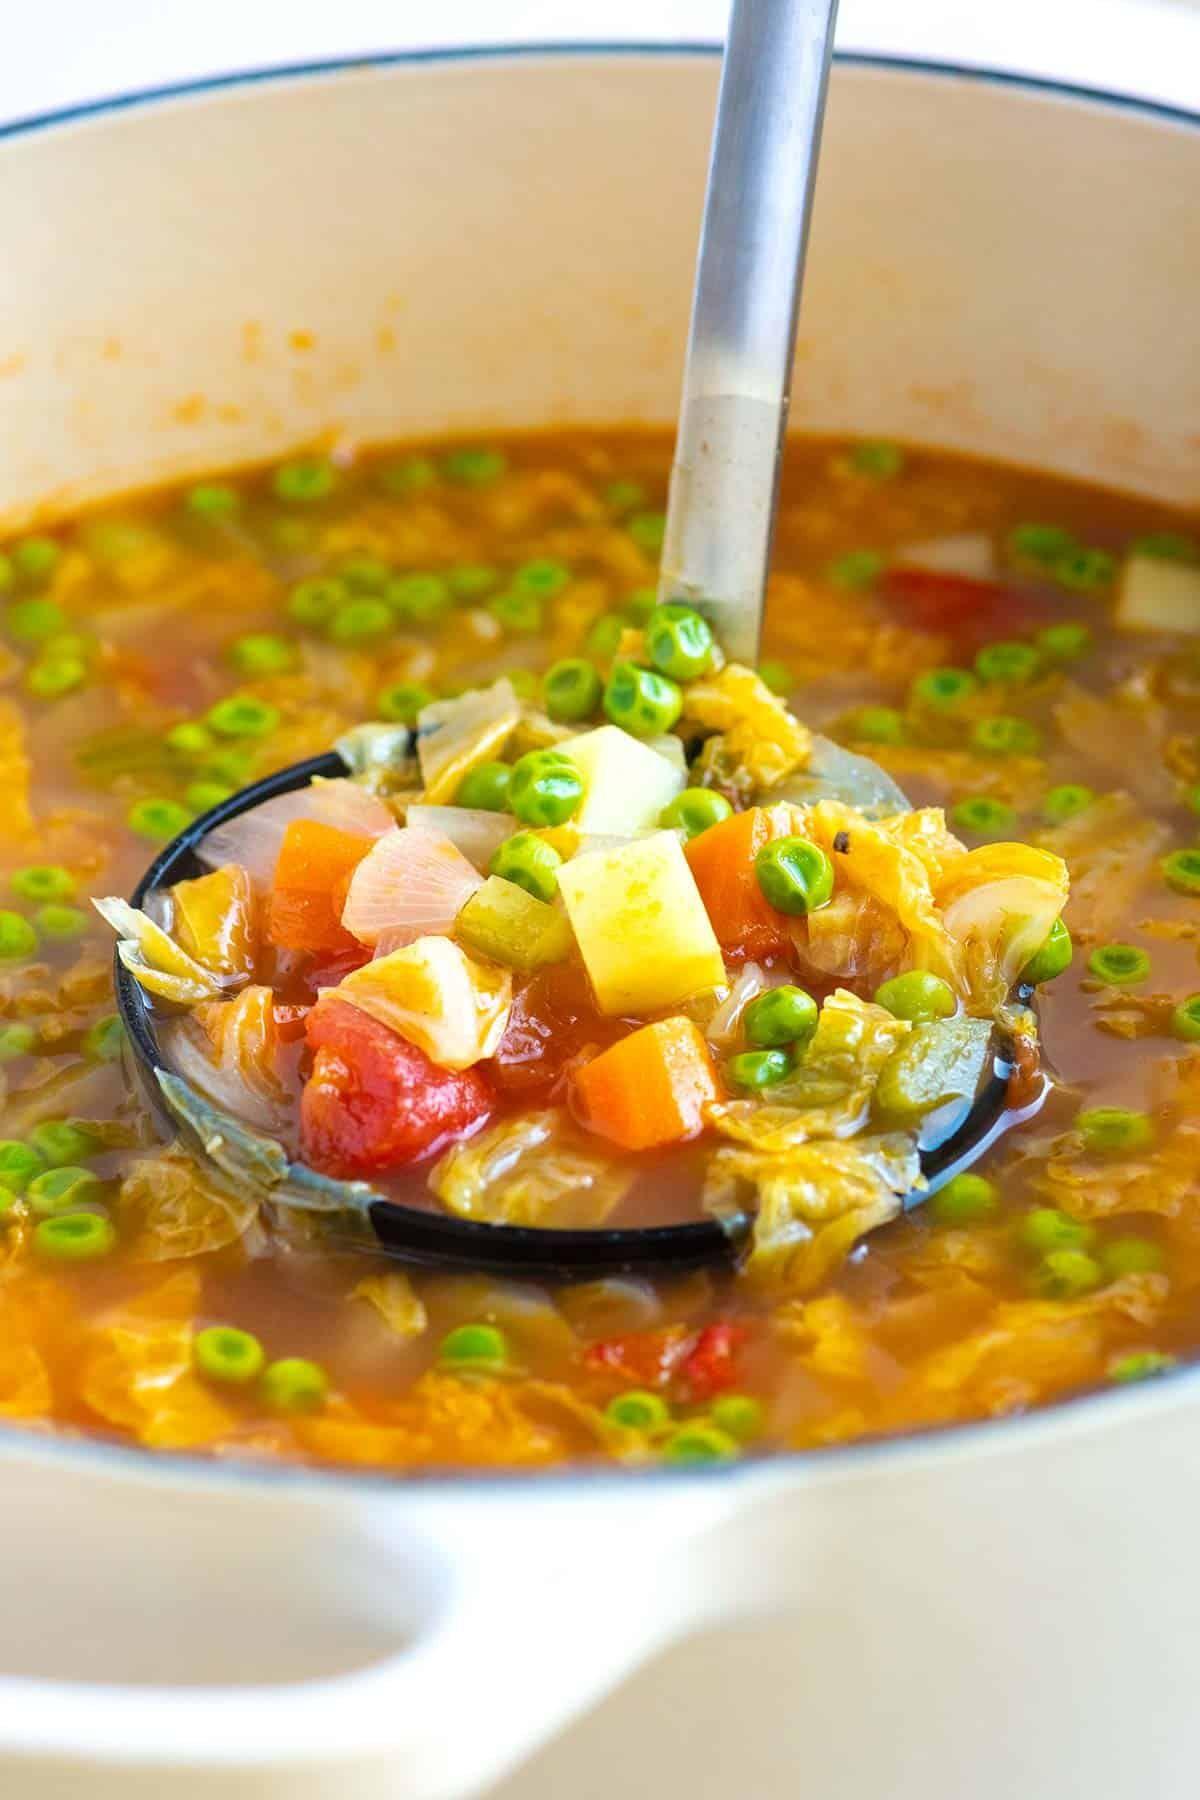 Easy Homemade Vegetable Soup Recipe Homemade Vegetable Soups Vegetable Soup Recipes Soup Recipes